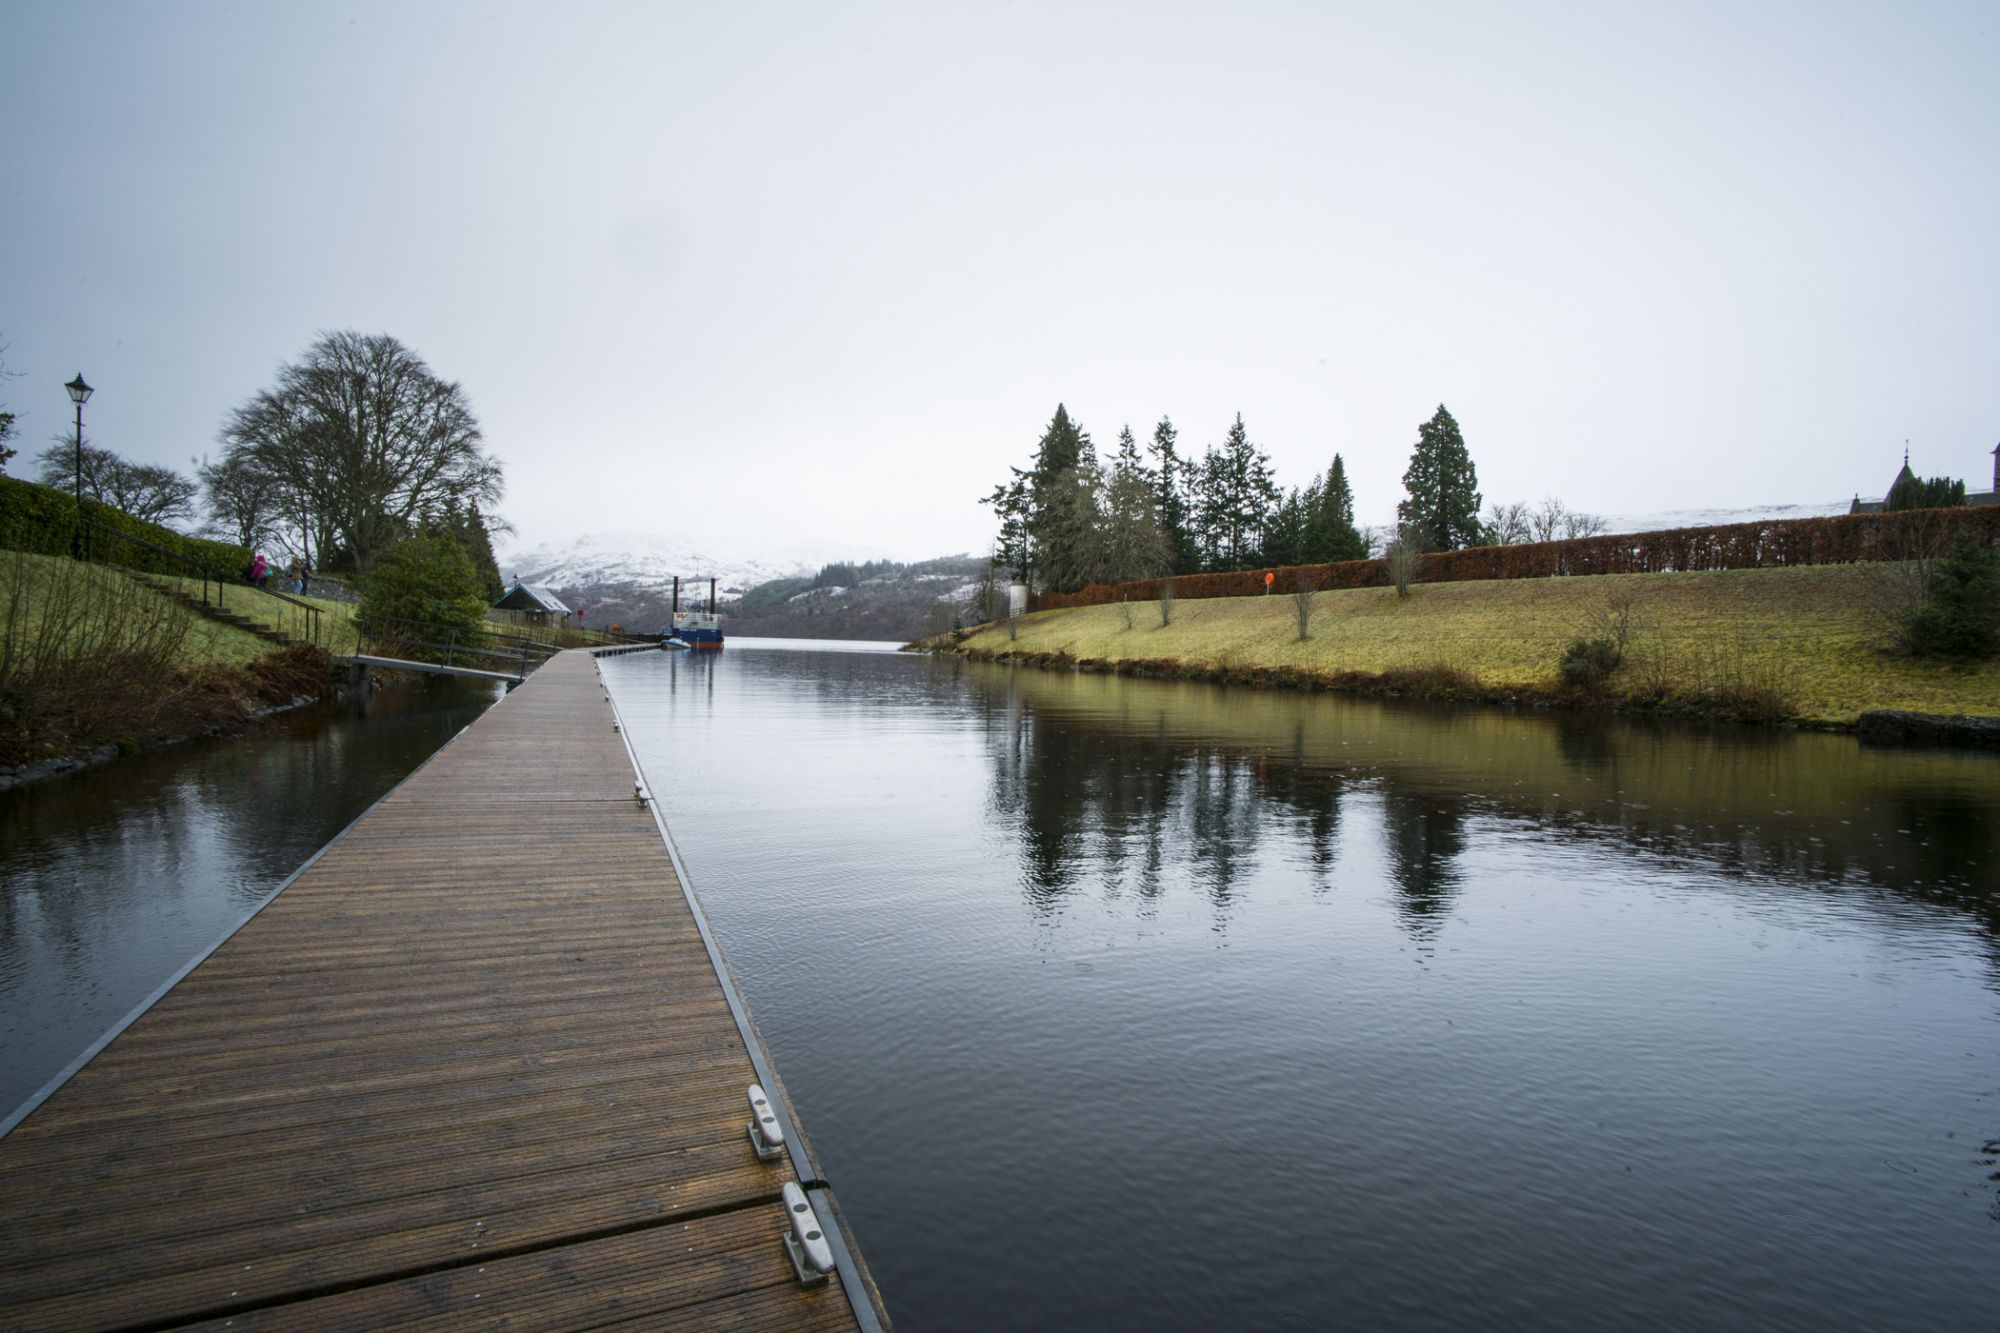 Loch Ness.... wheres Nessie?